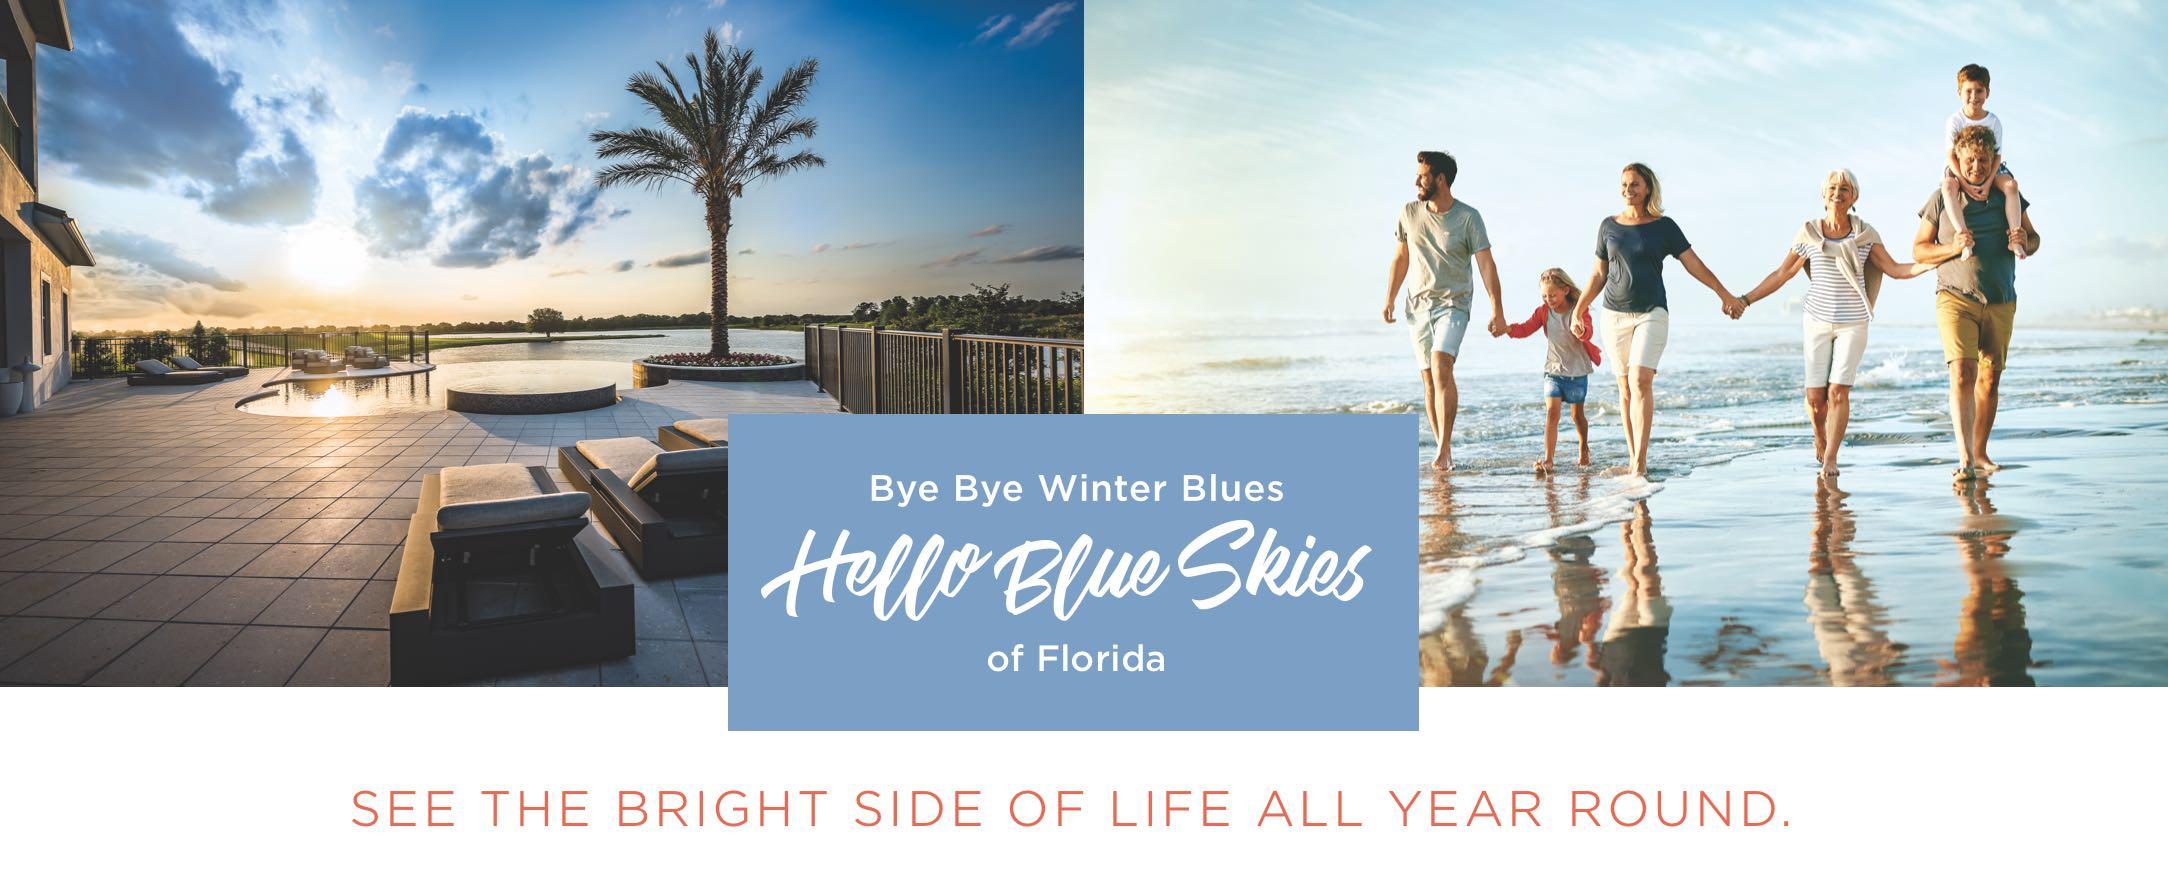 Fly & Buy Florida